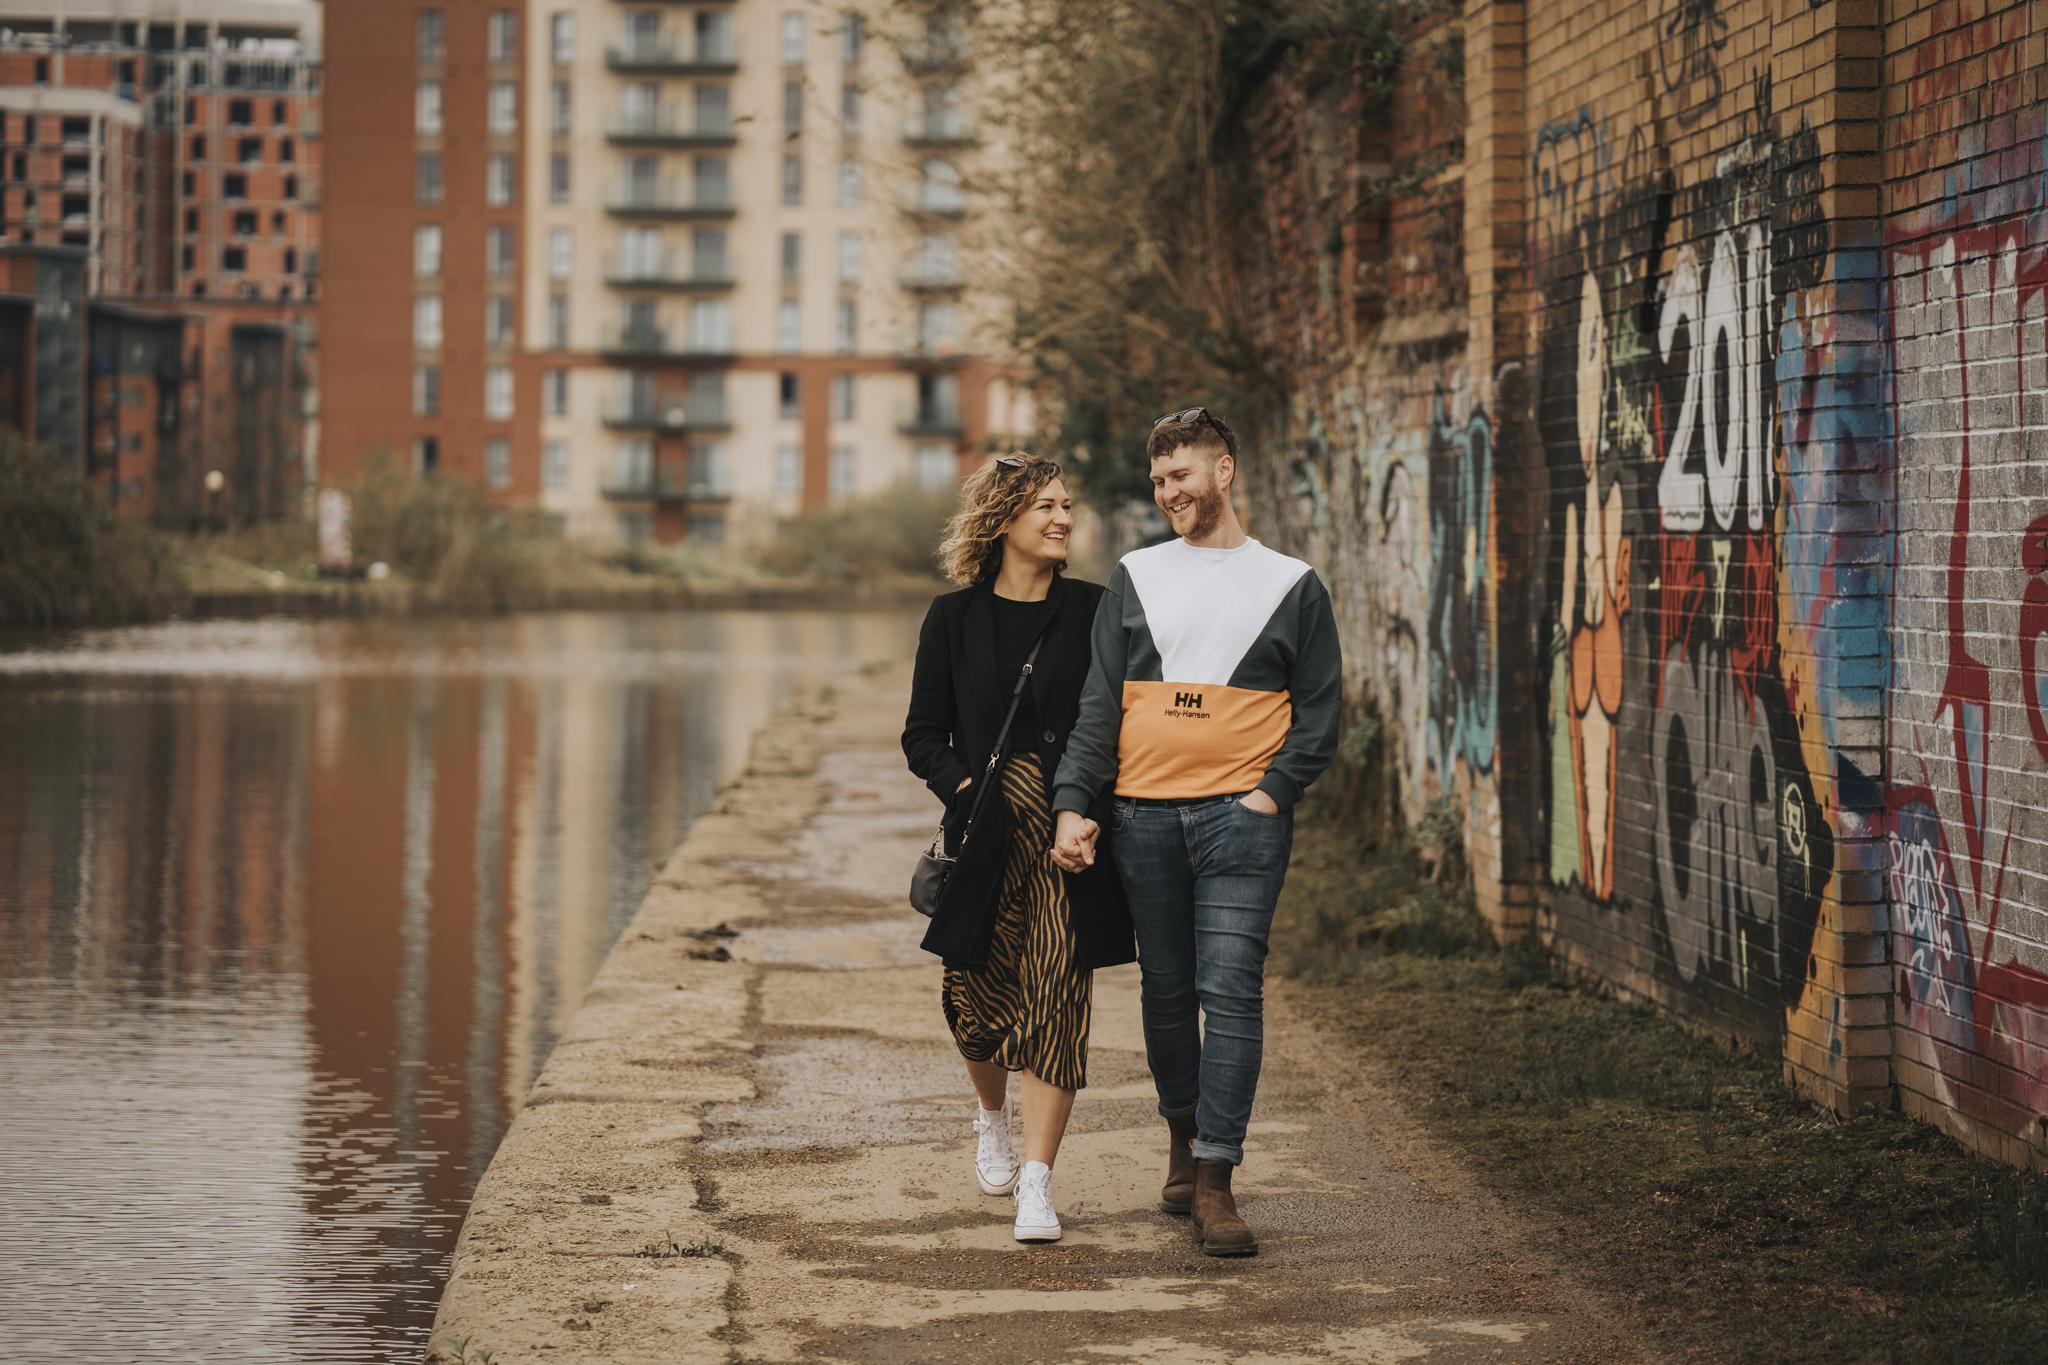 Sarah + Dan - Deansgate Castlefield-35.jpg